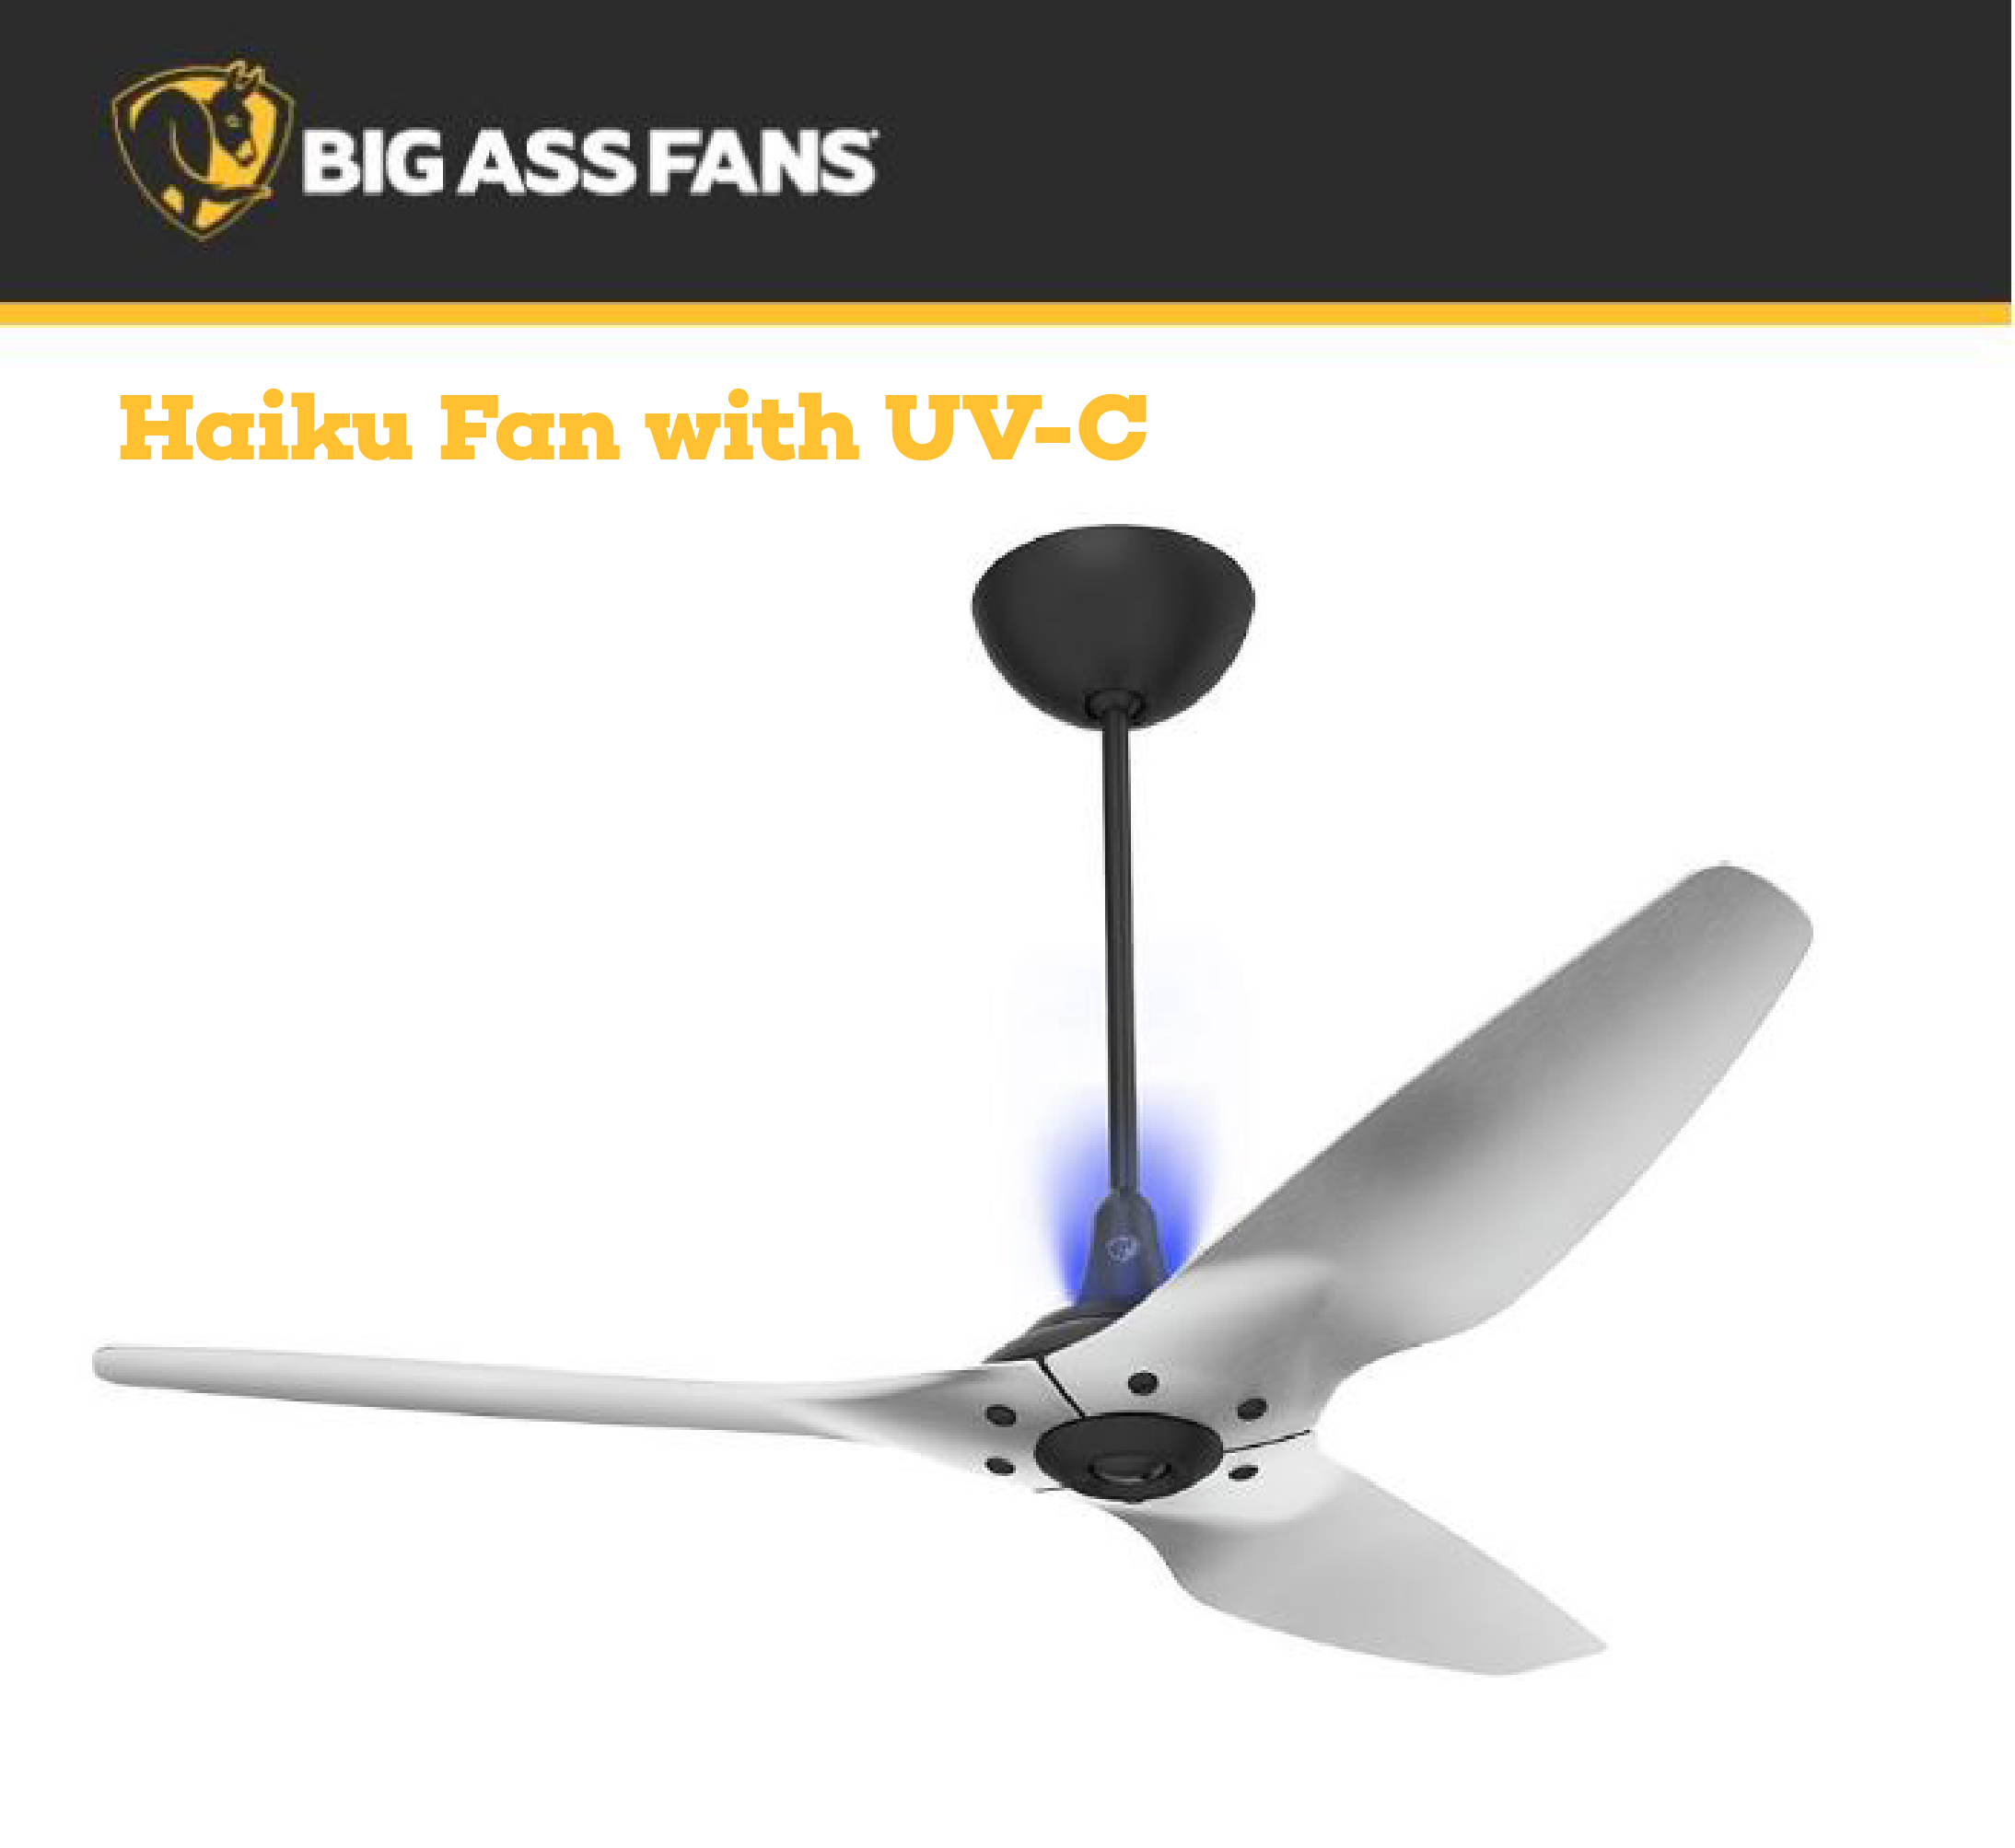 NEW PRODUCT ANNOUNCEMENT       Big Ass Fans   Haiku Fan with UV-C